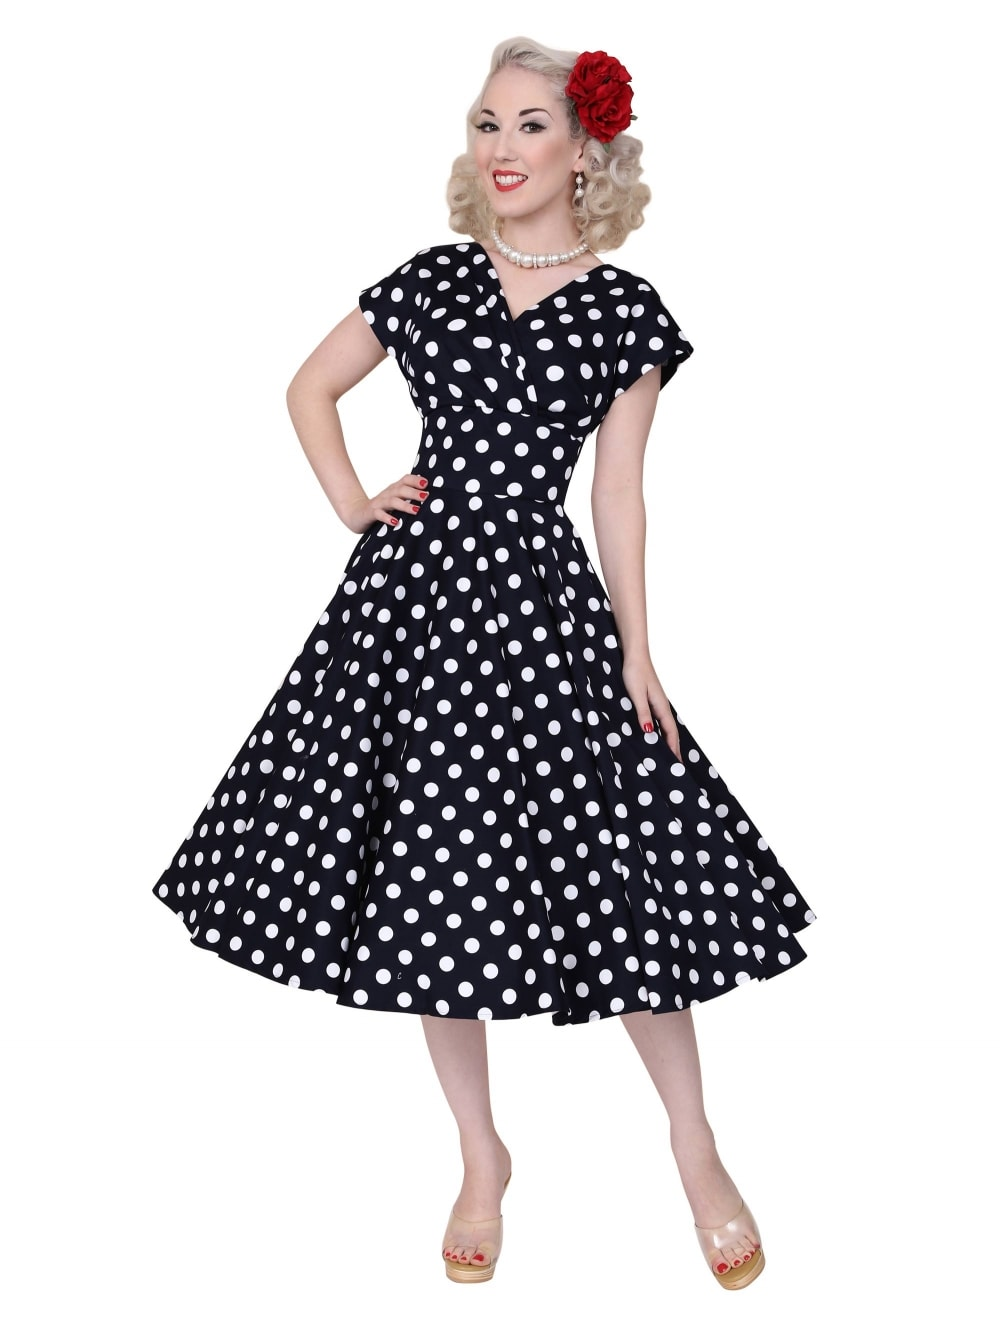 Grace Dress Black White Polkadot From Vivien Of Holloway